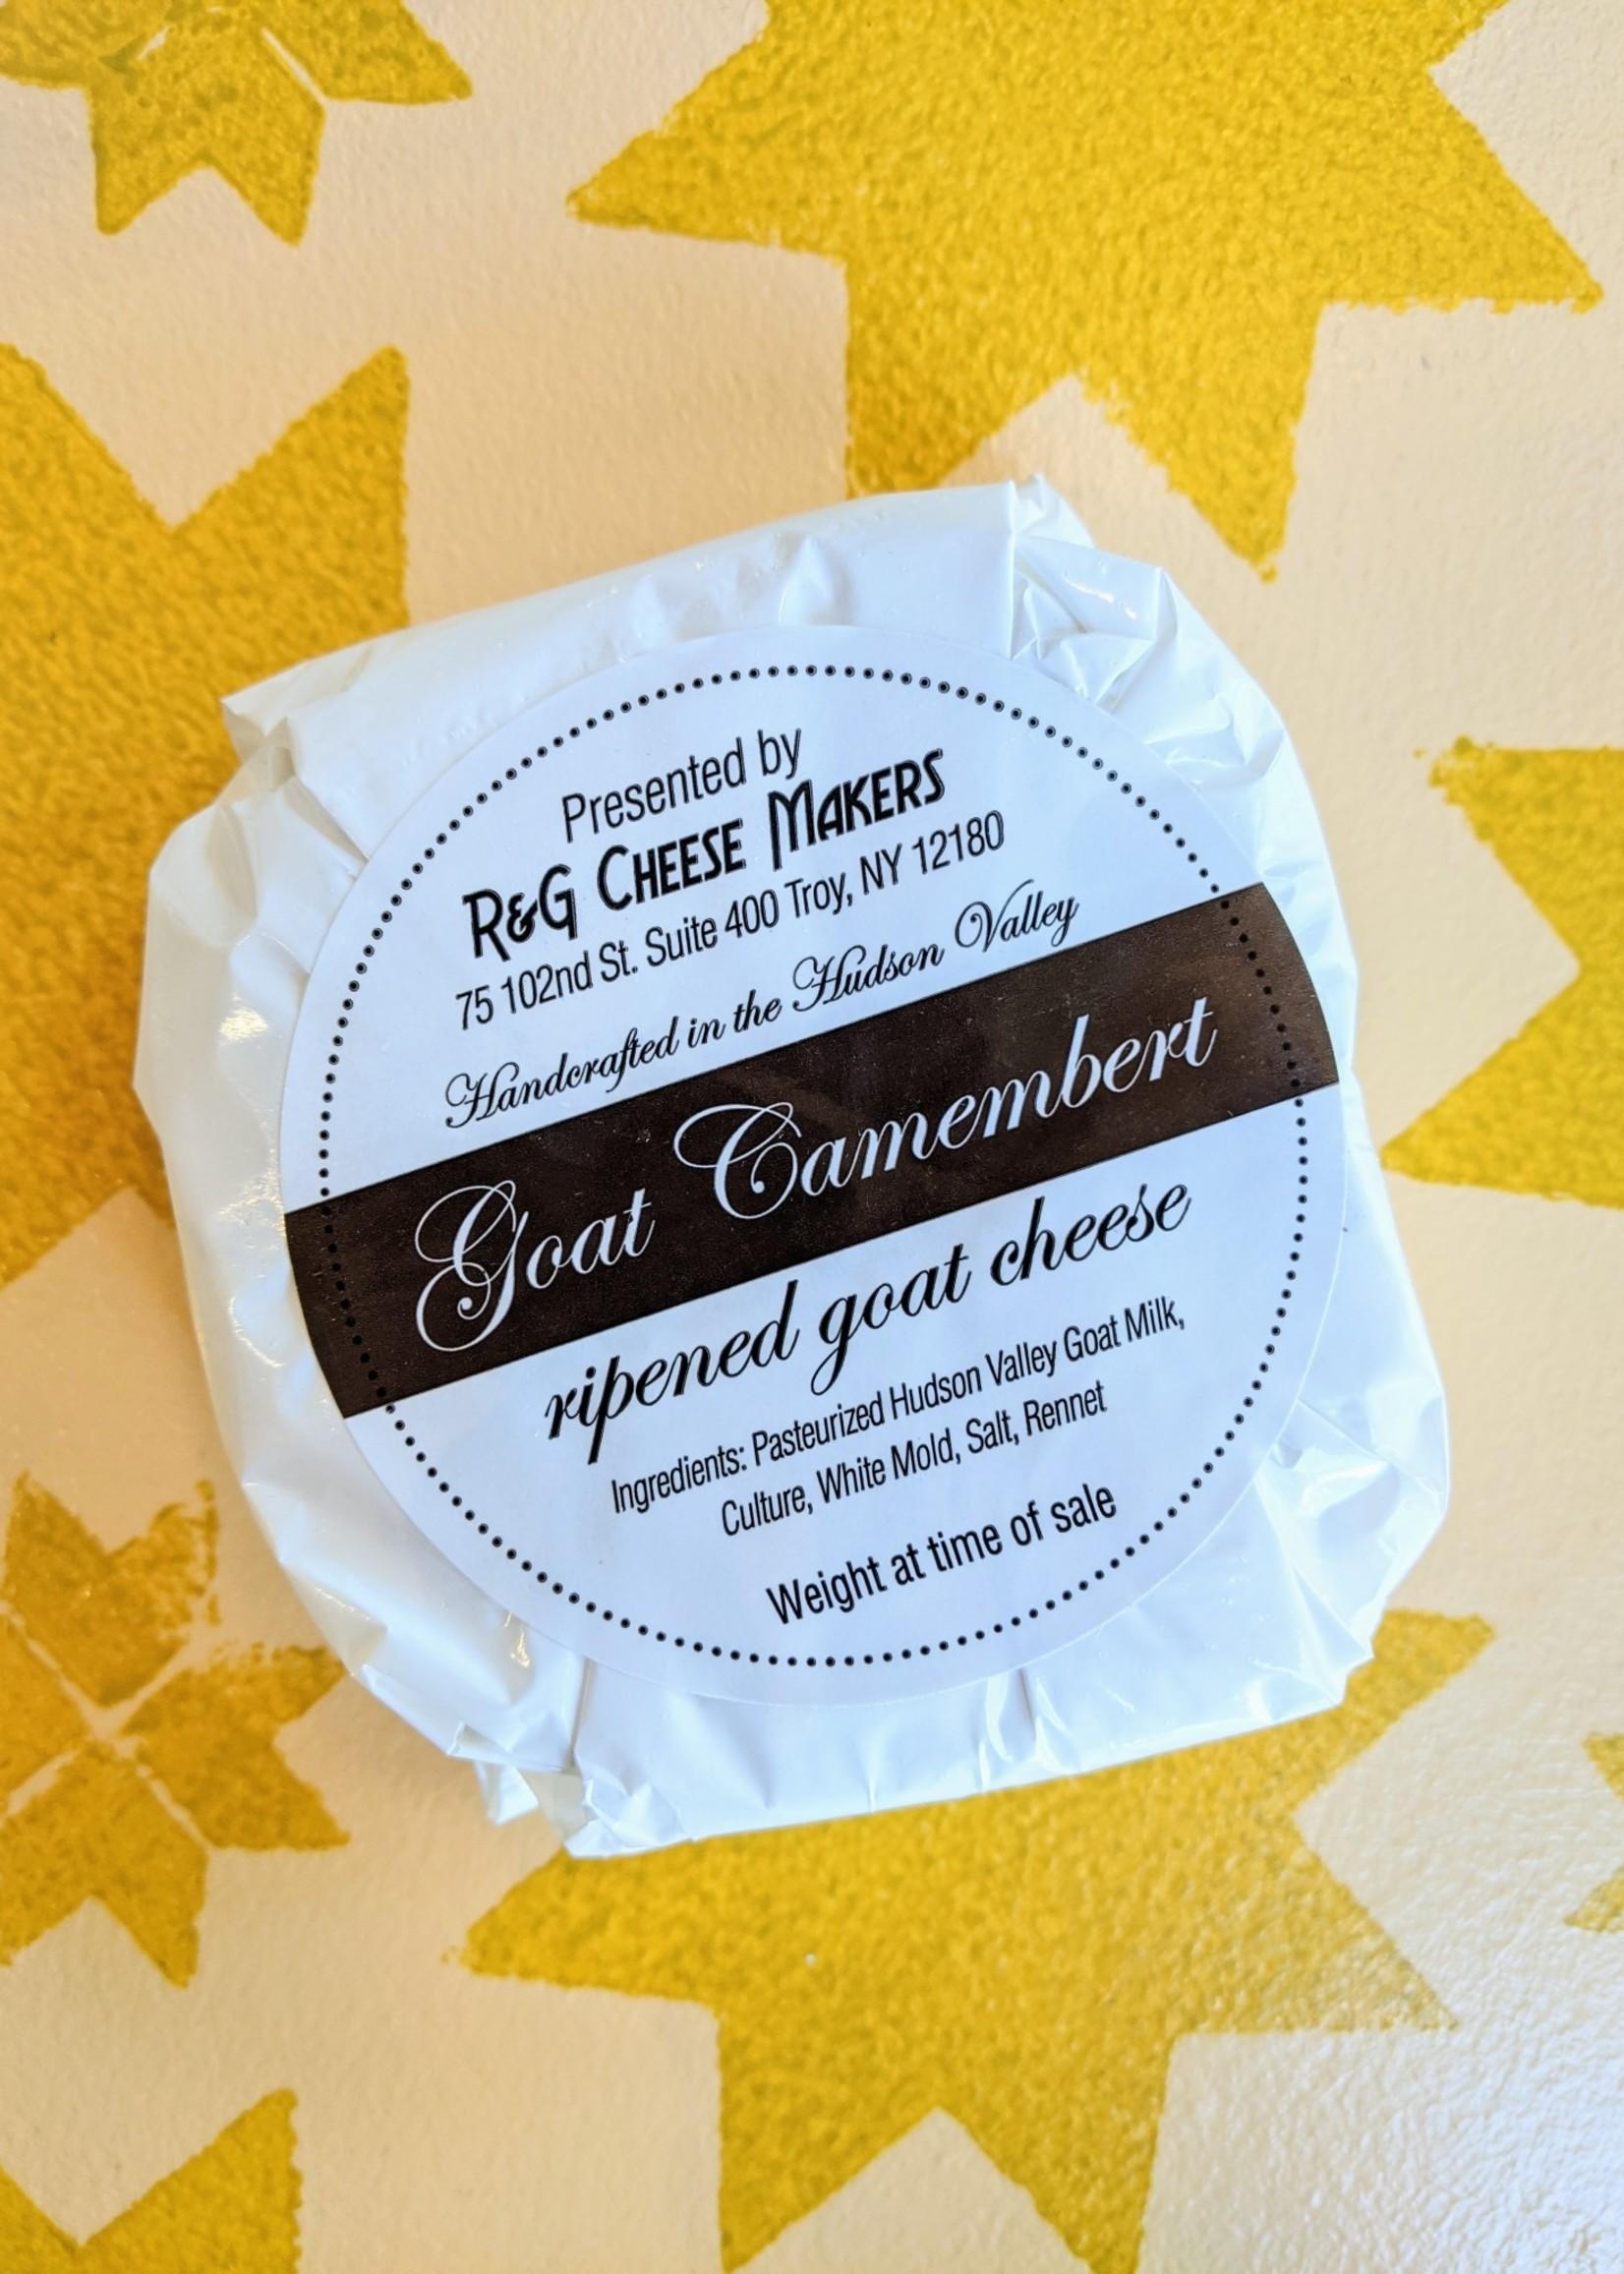 R&G Cheese Makers Goat Camembert